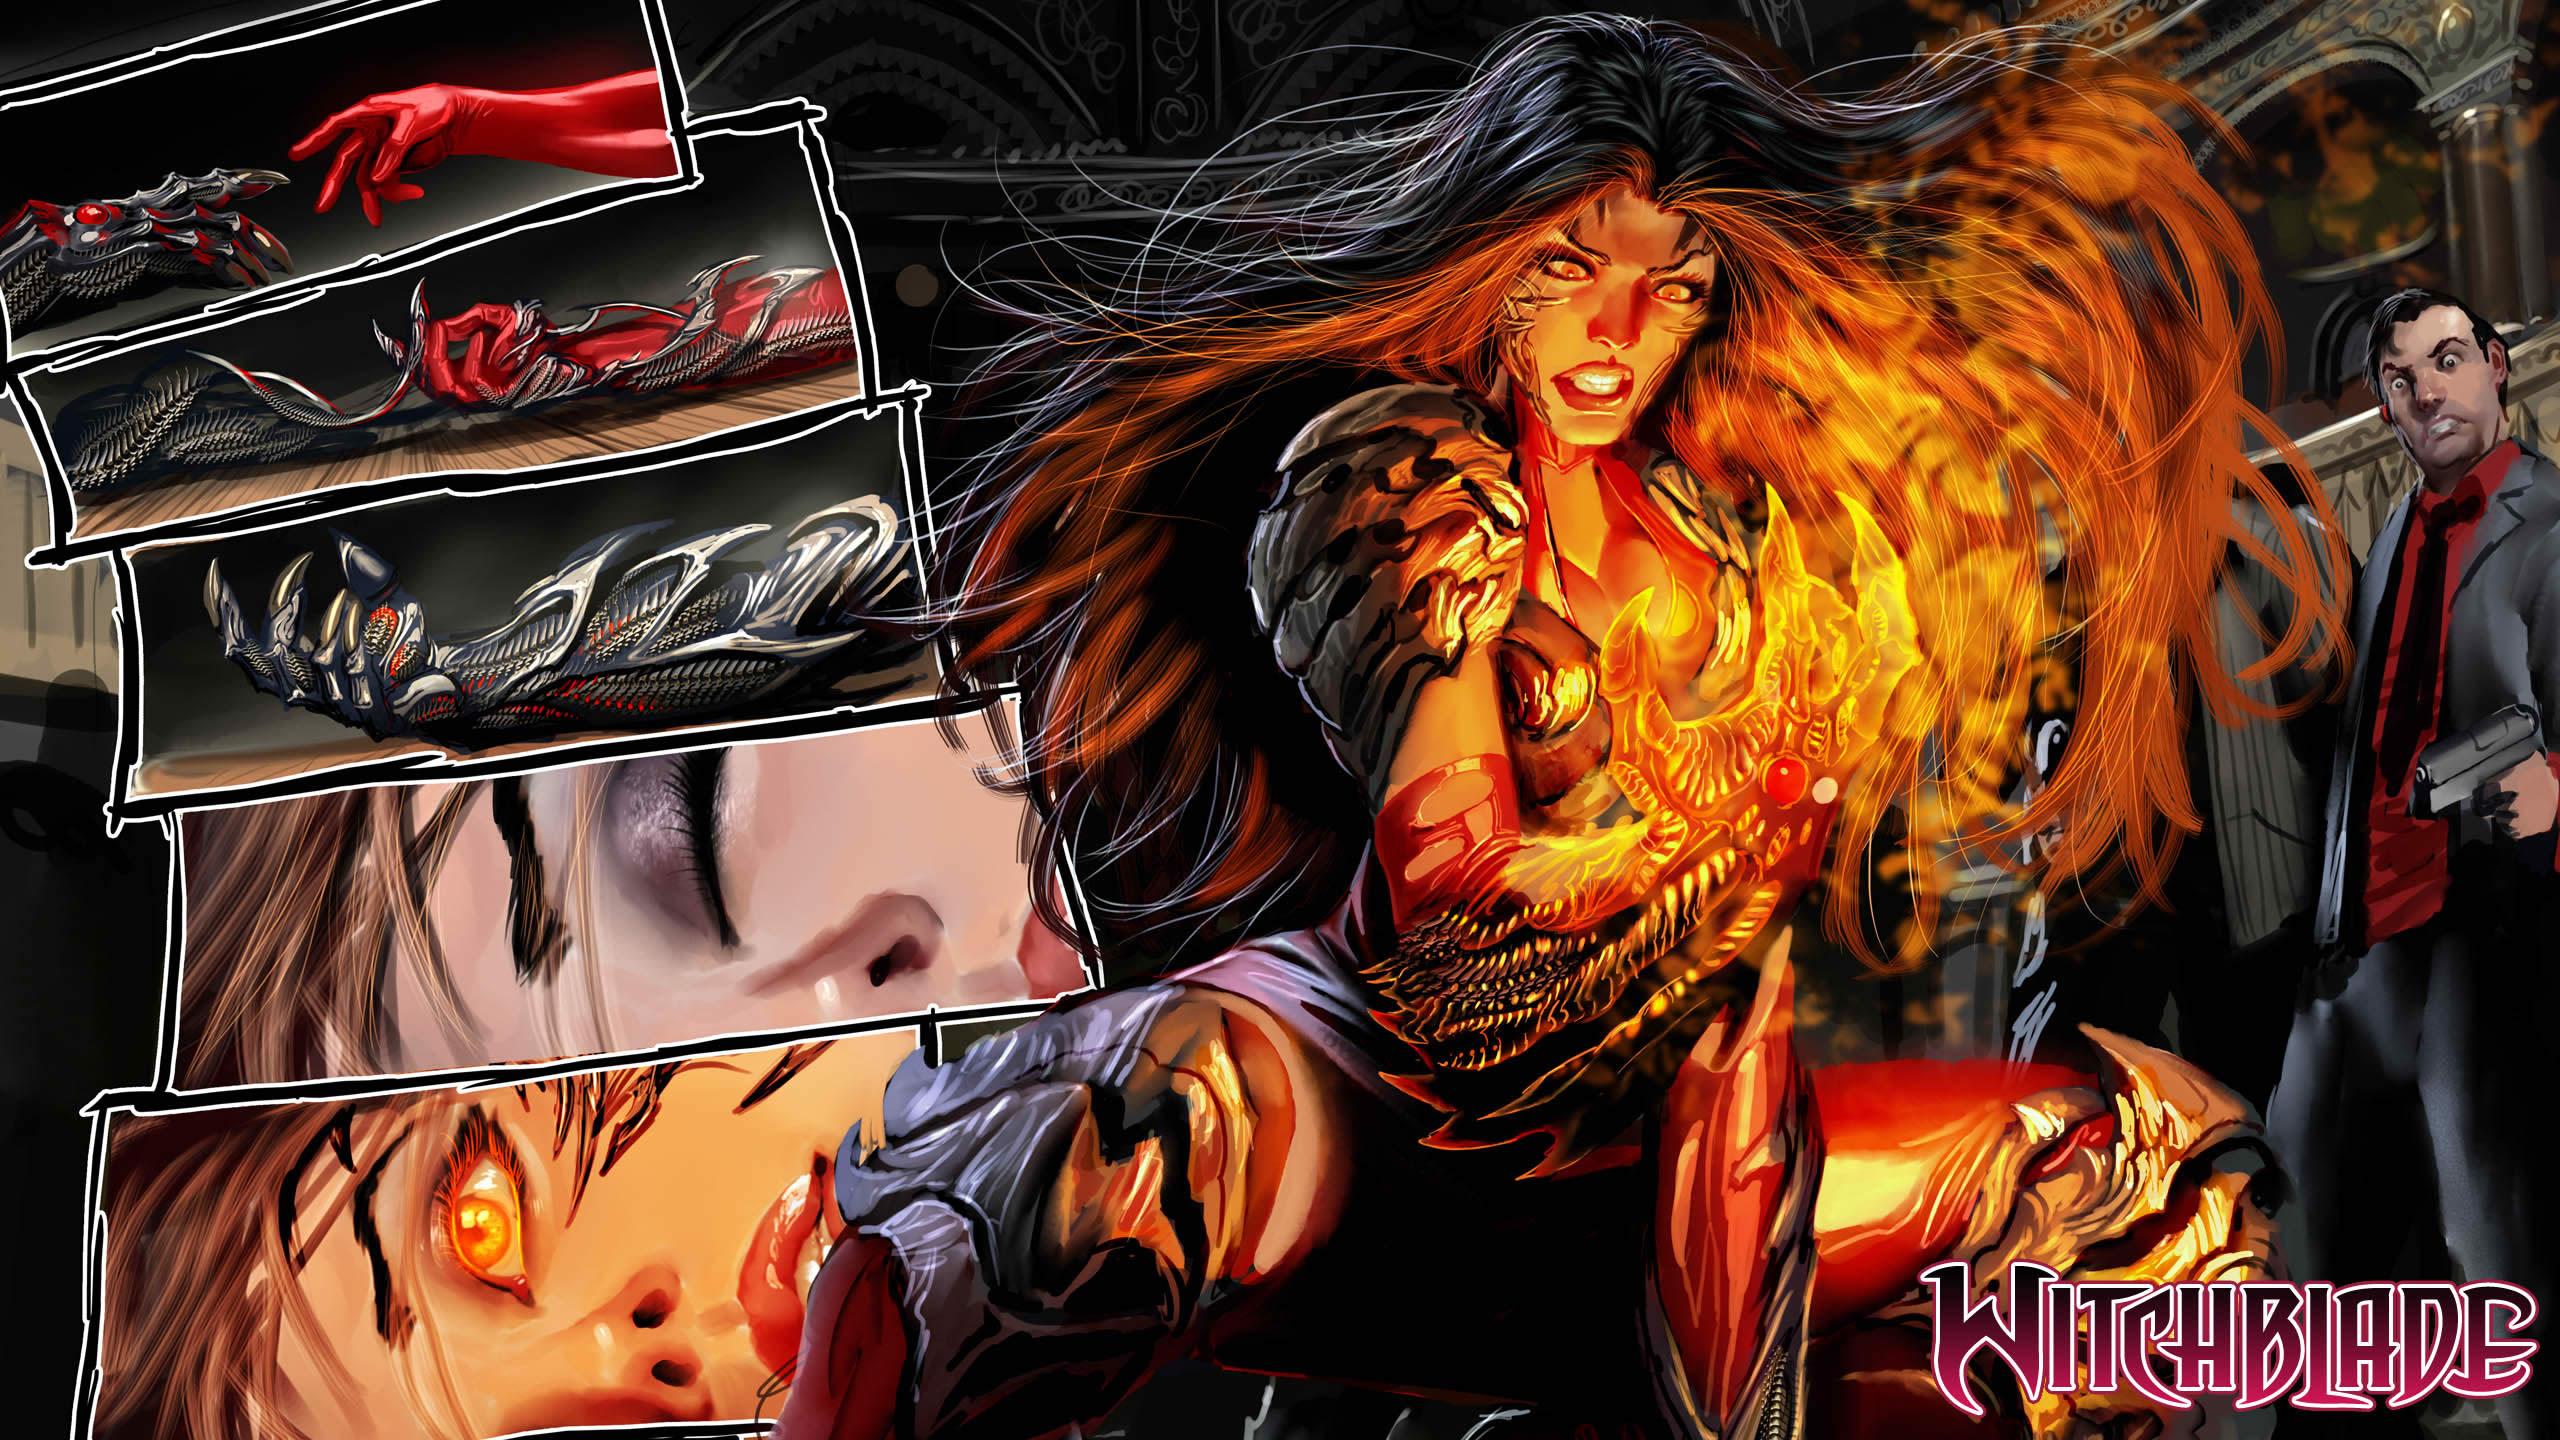 Girl Superhero Wallpapers - Top Free Girl Superhero